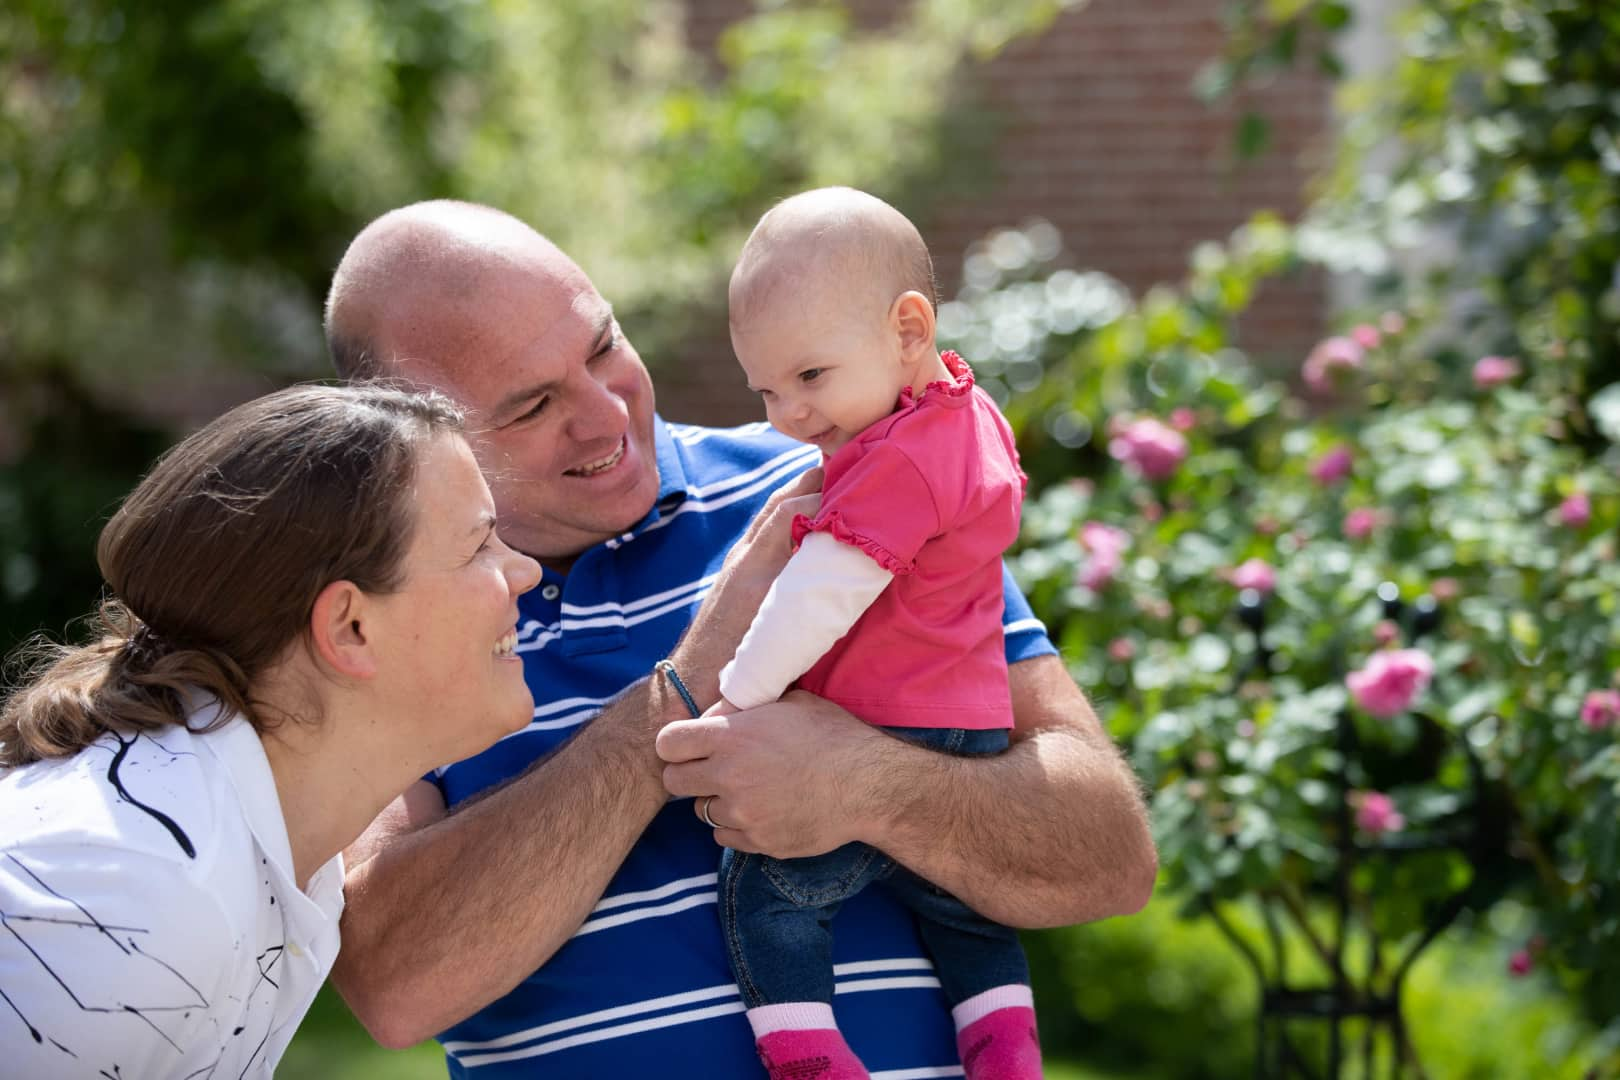 Gut Landegge Familotel Emsland Babyurlaub Babyhotel Familienurlaub Urlaub mit Baby